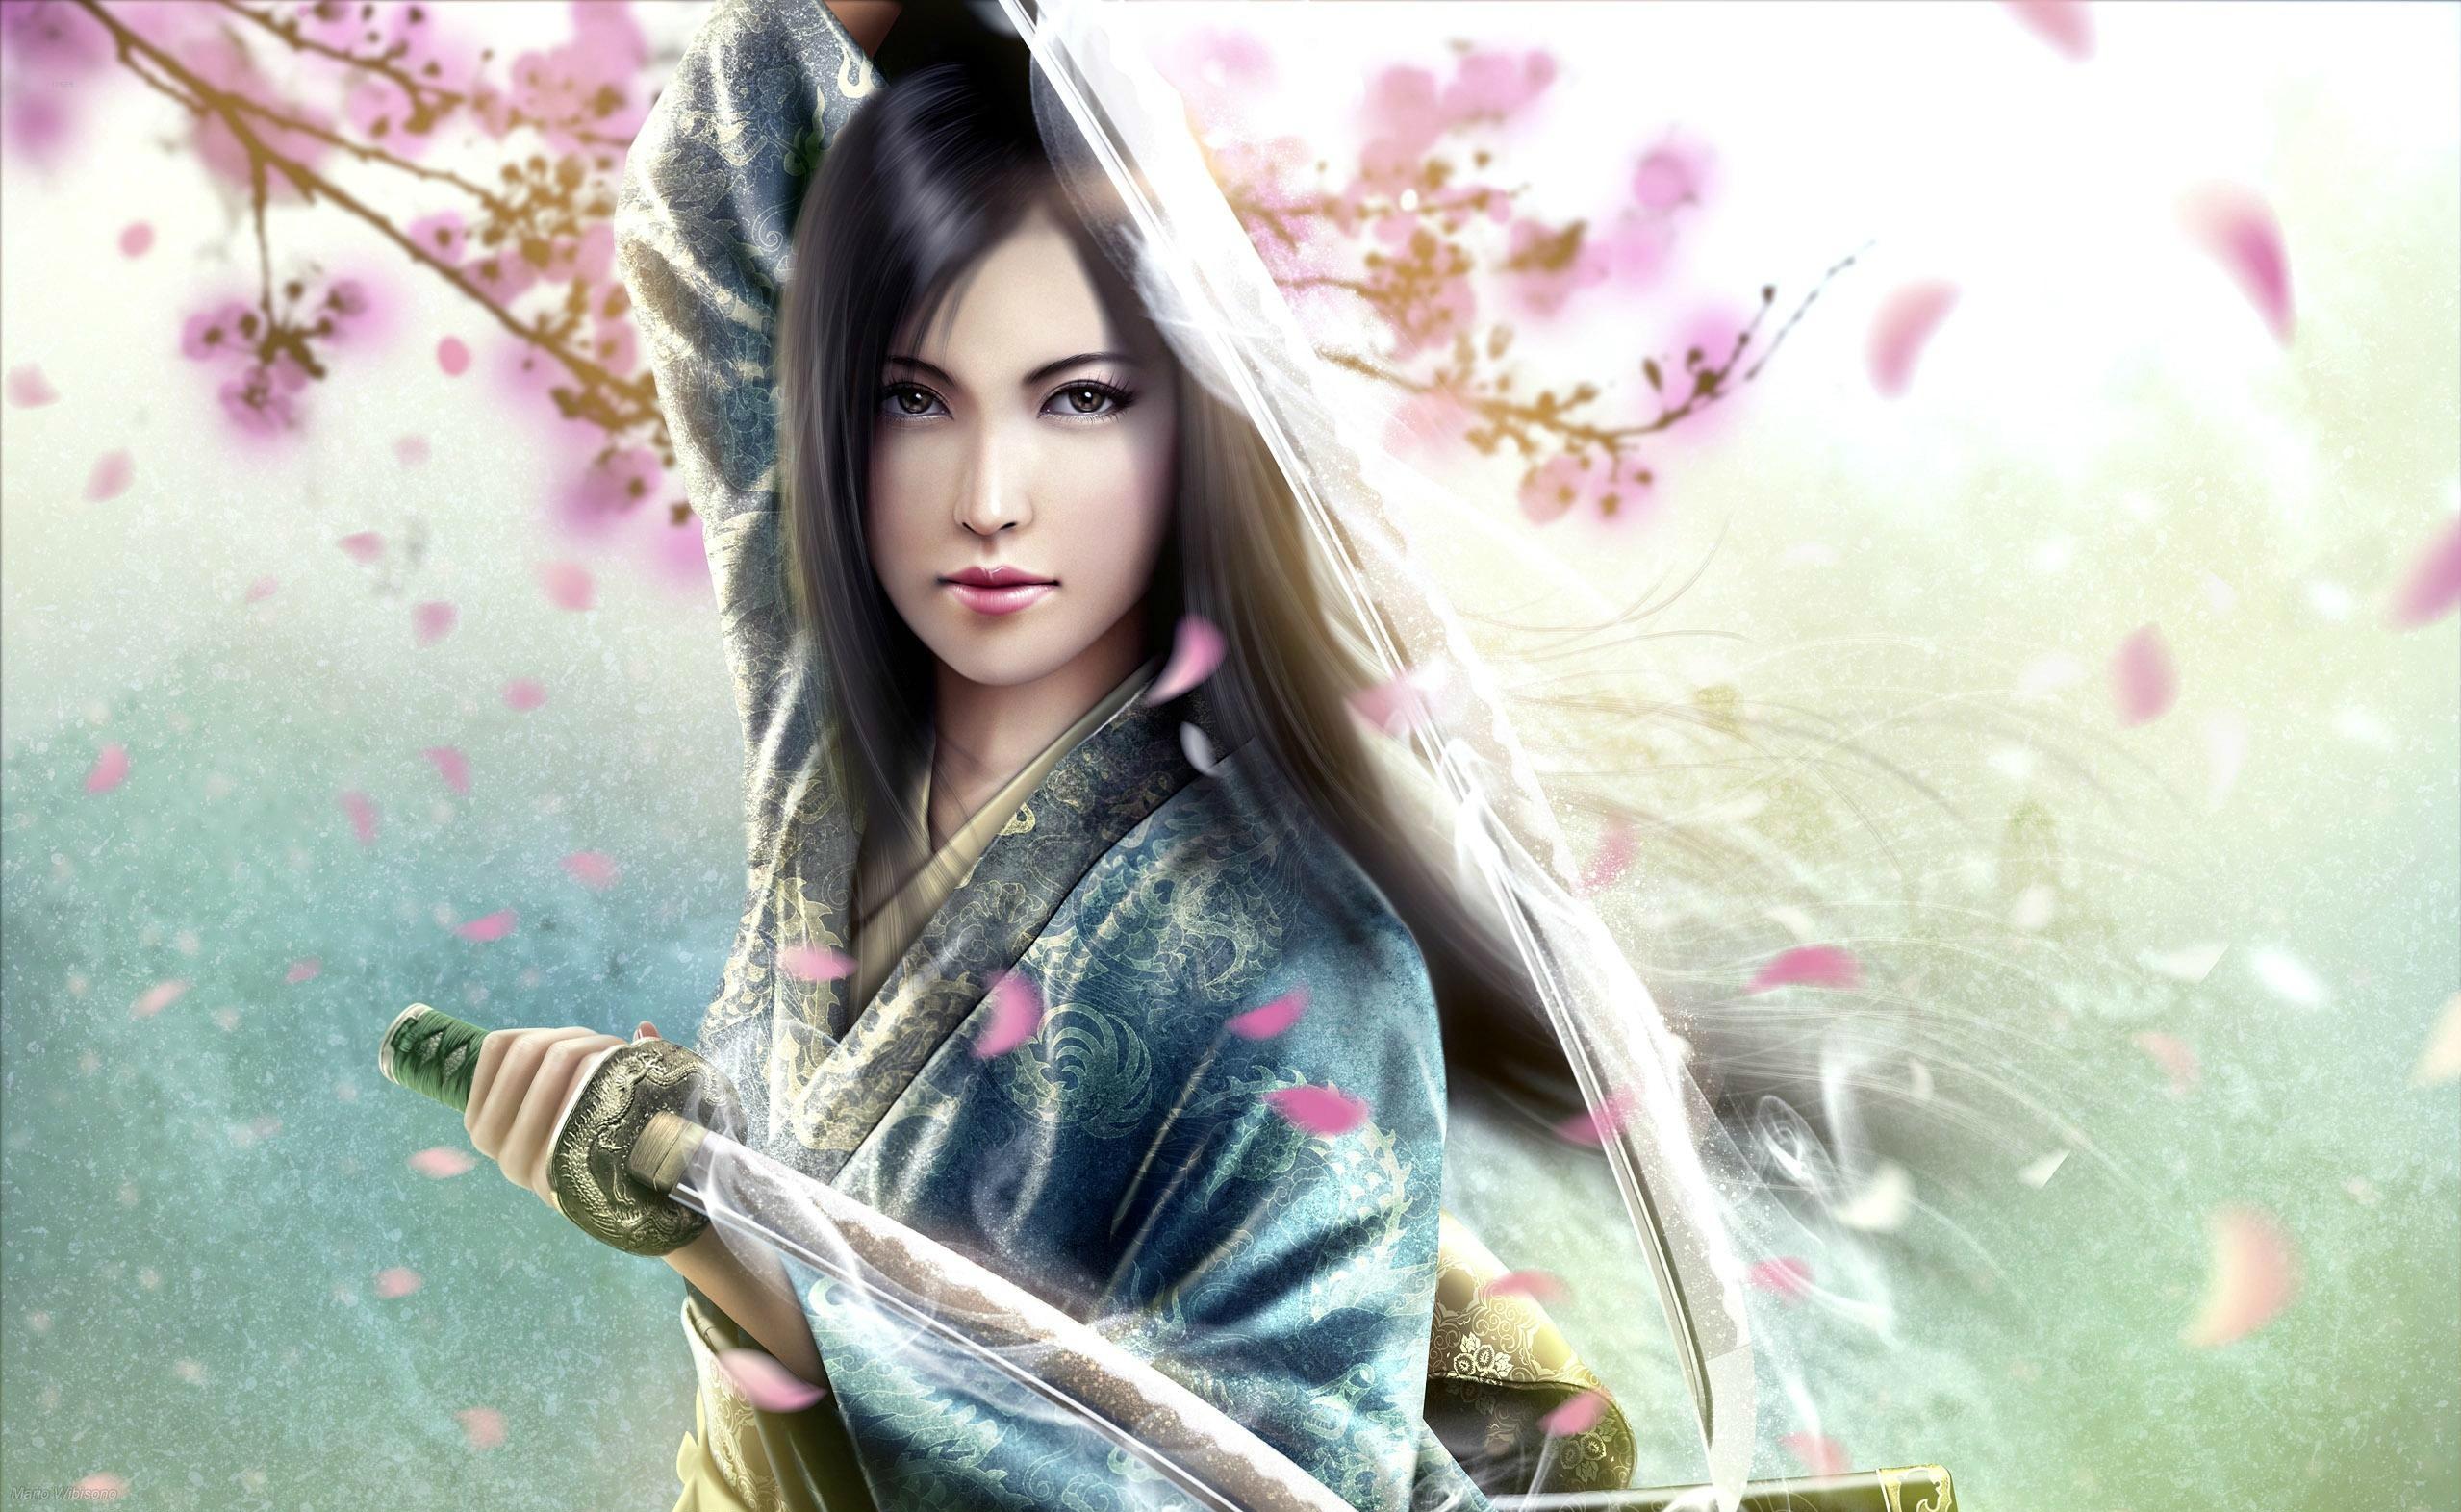 Dagger Fantasy Girl Warrior Weapon White Hair Woman · HD Wallpaper    Background ID:152076